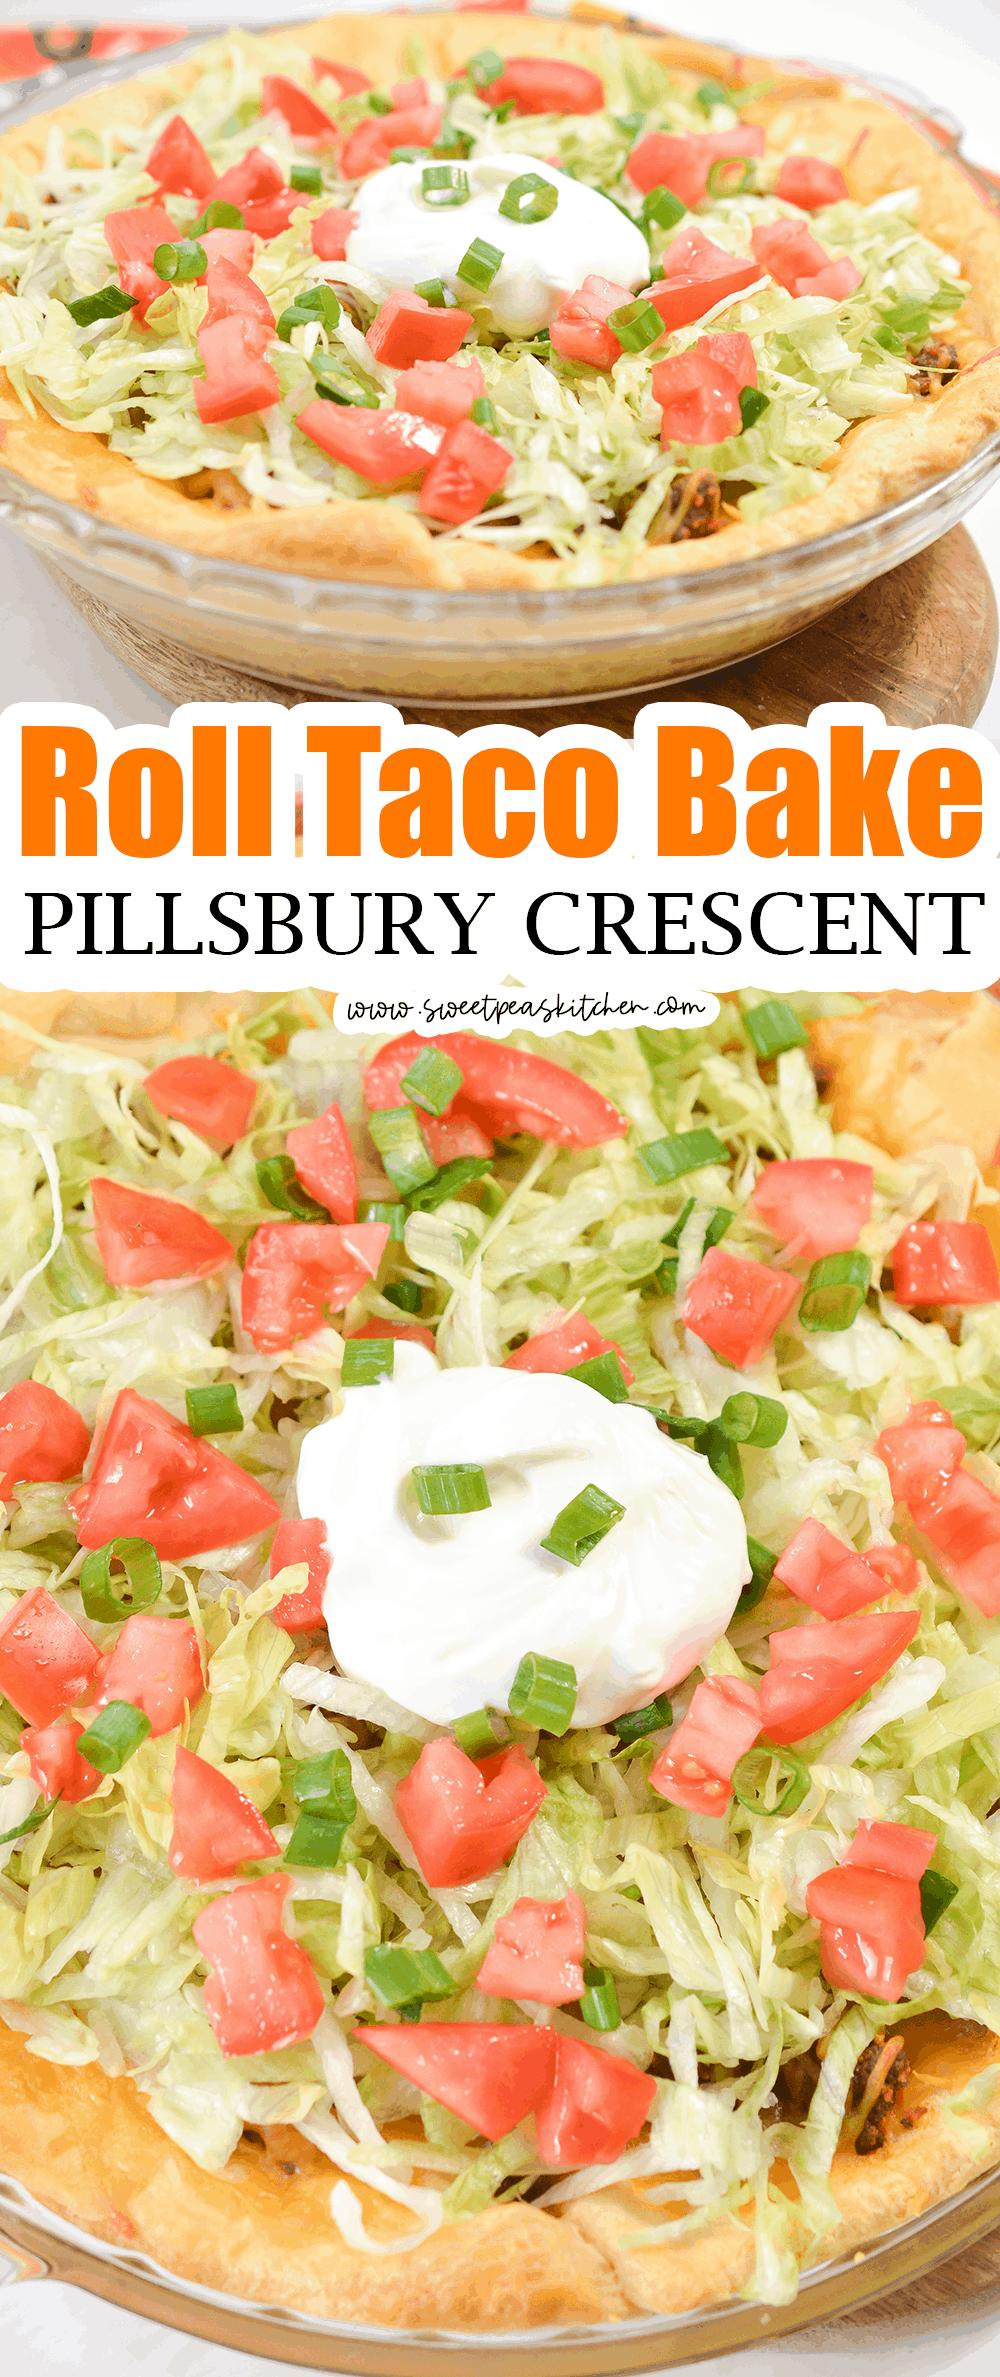 Pillsbury Crescent Roll Taco Bake